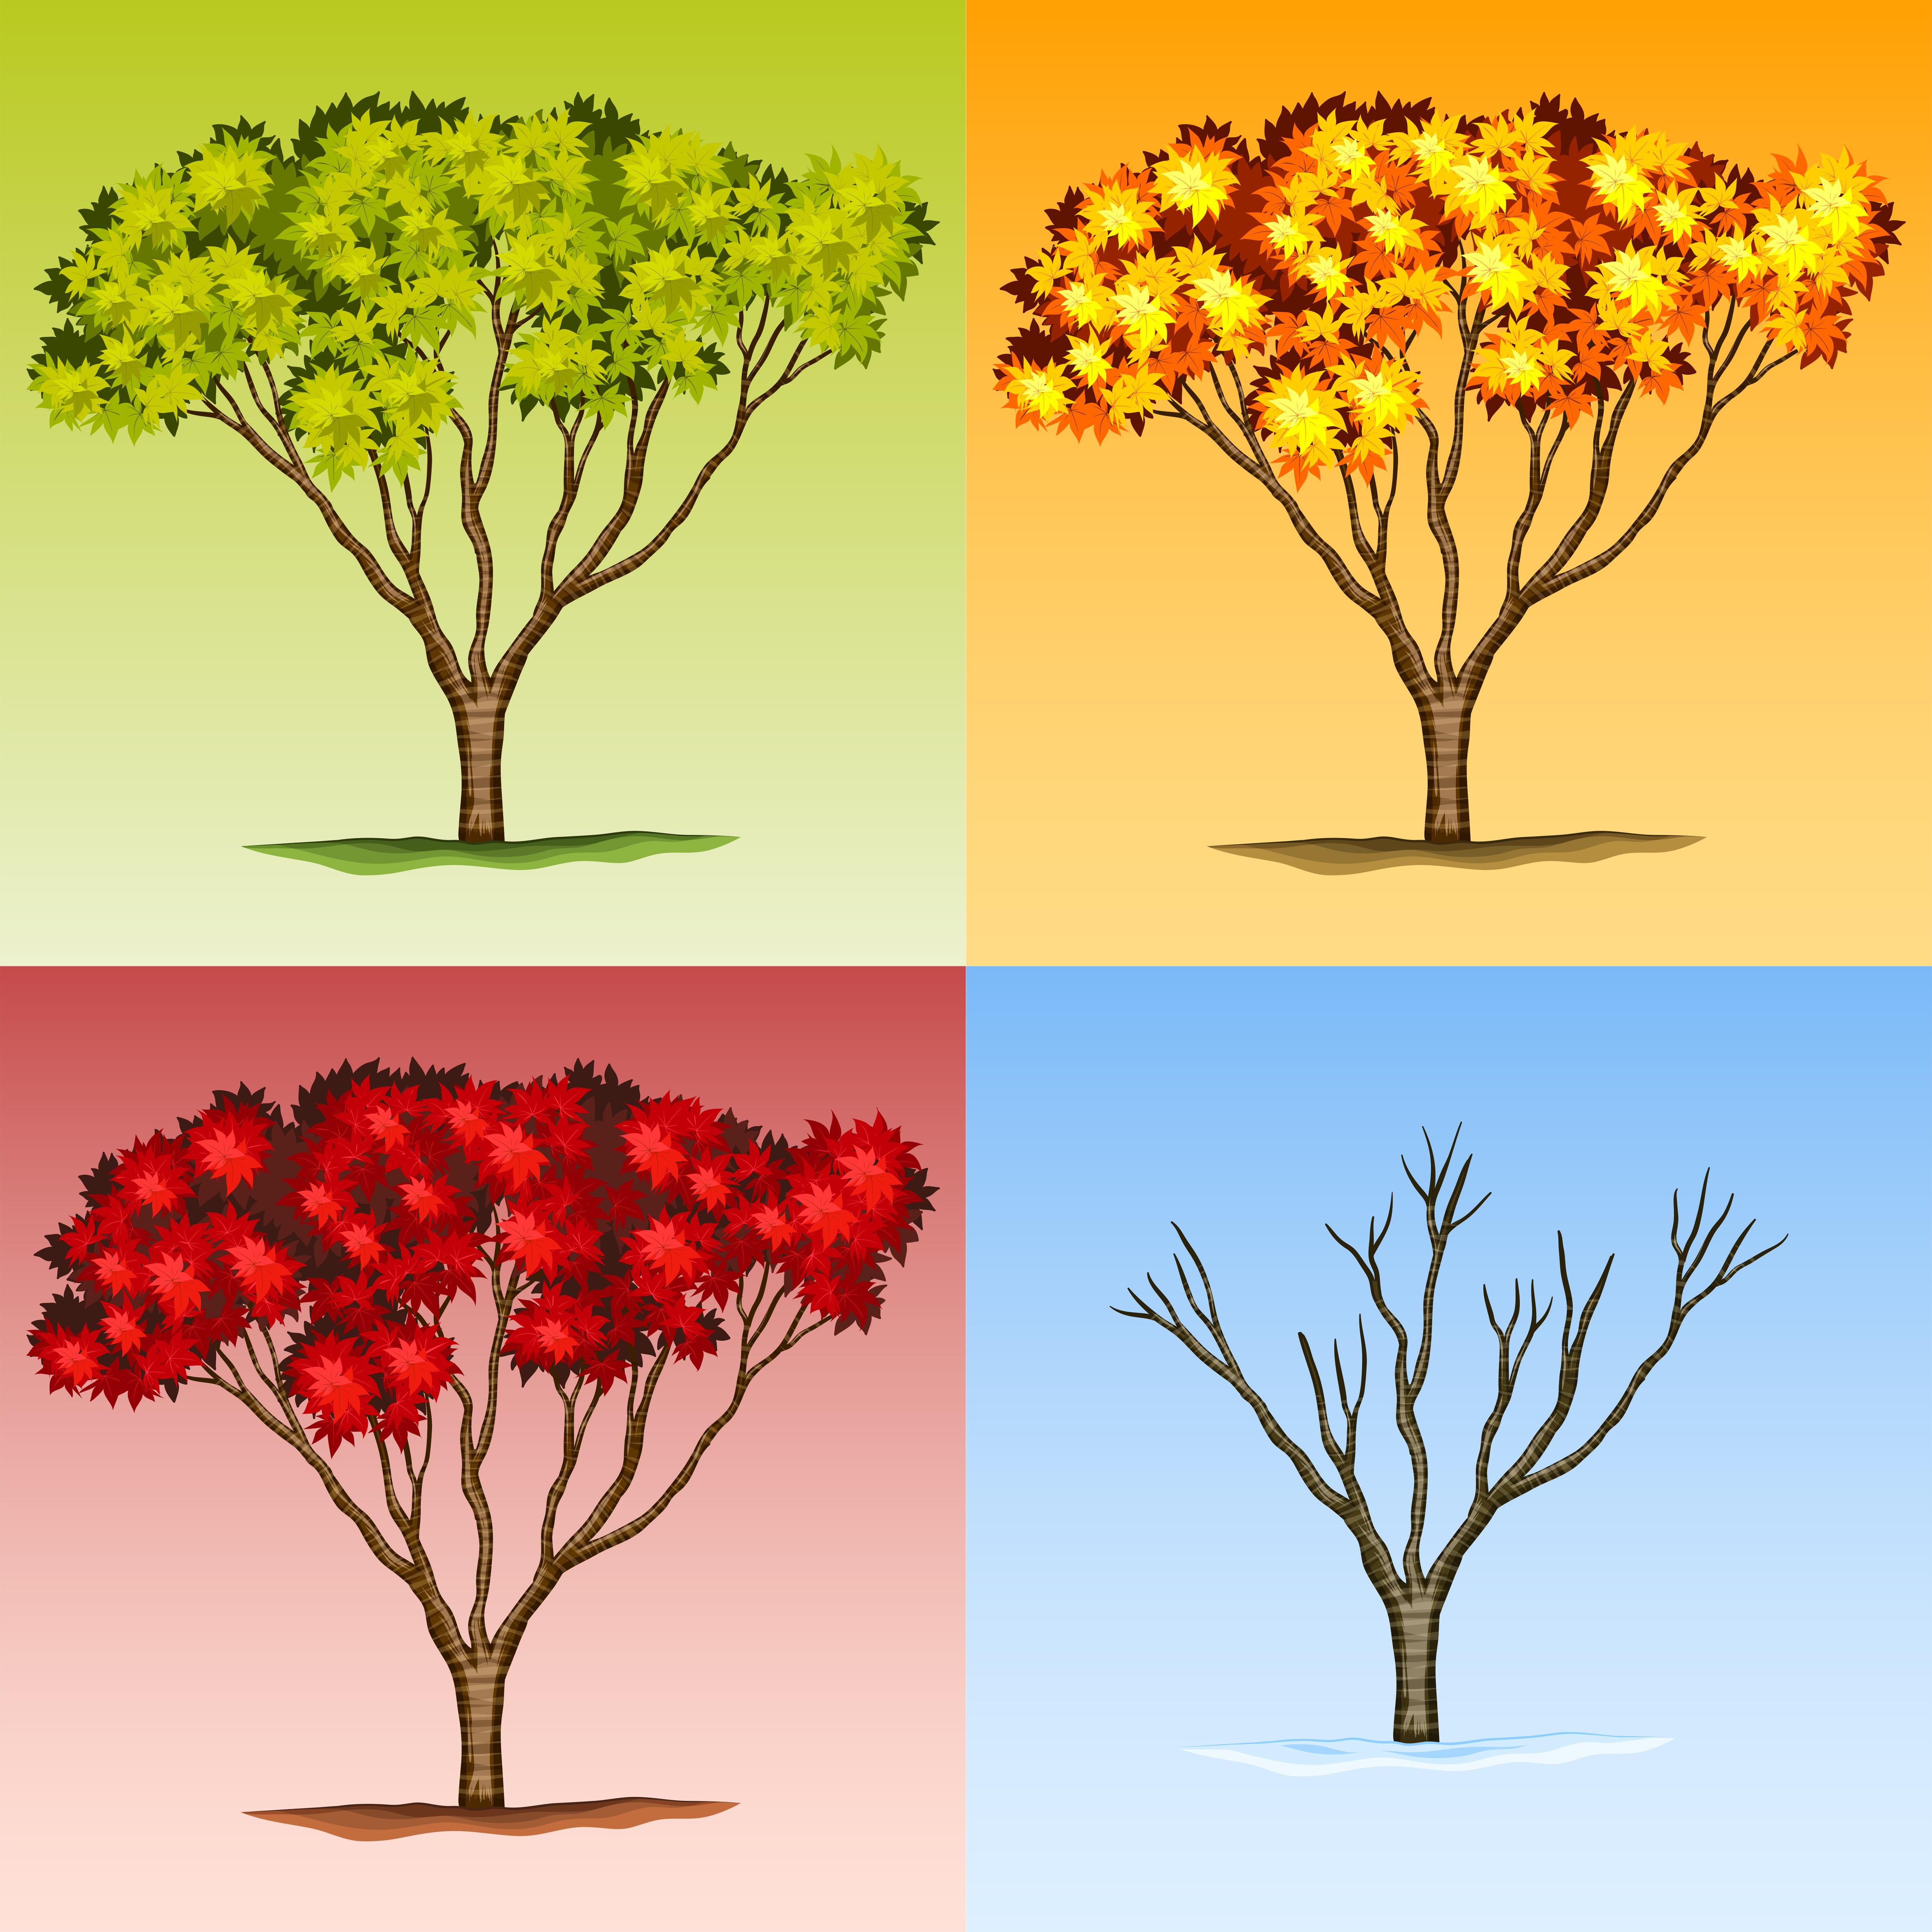 scene of tree in different seasons